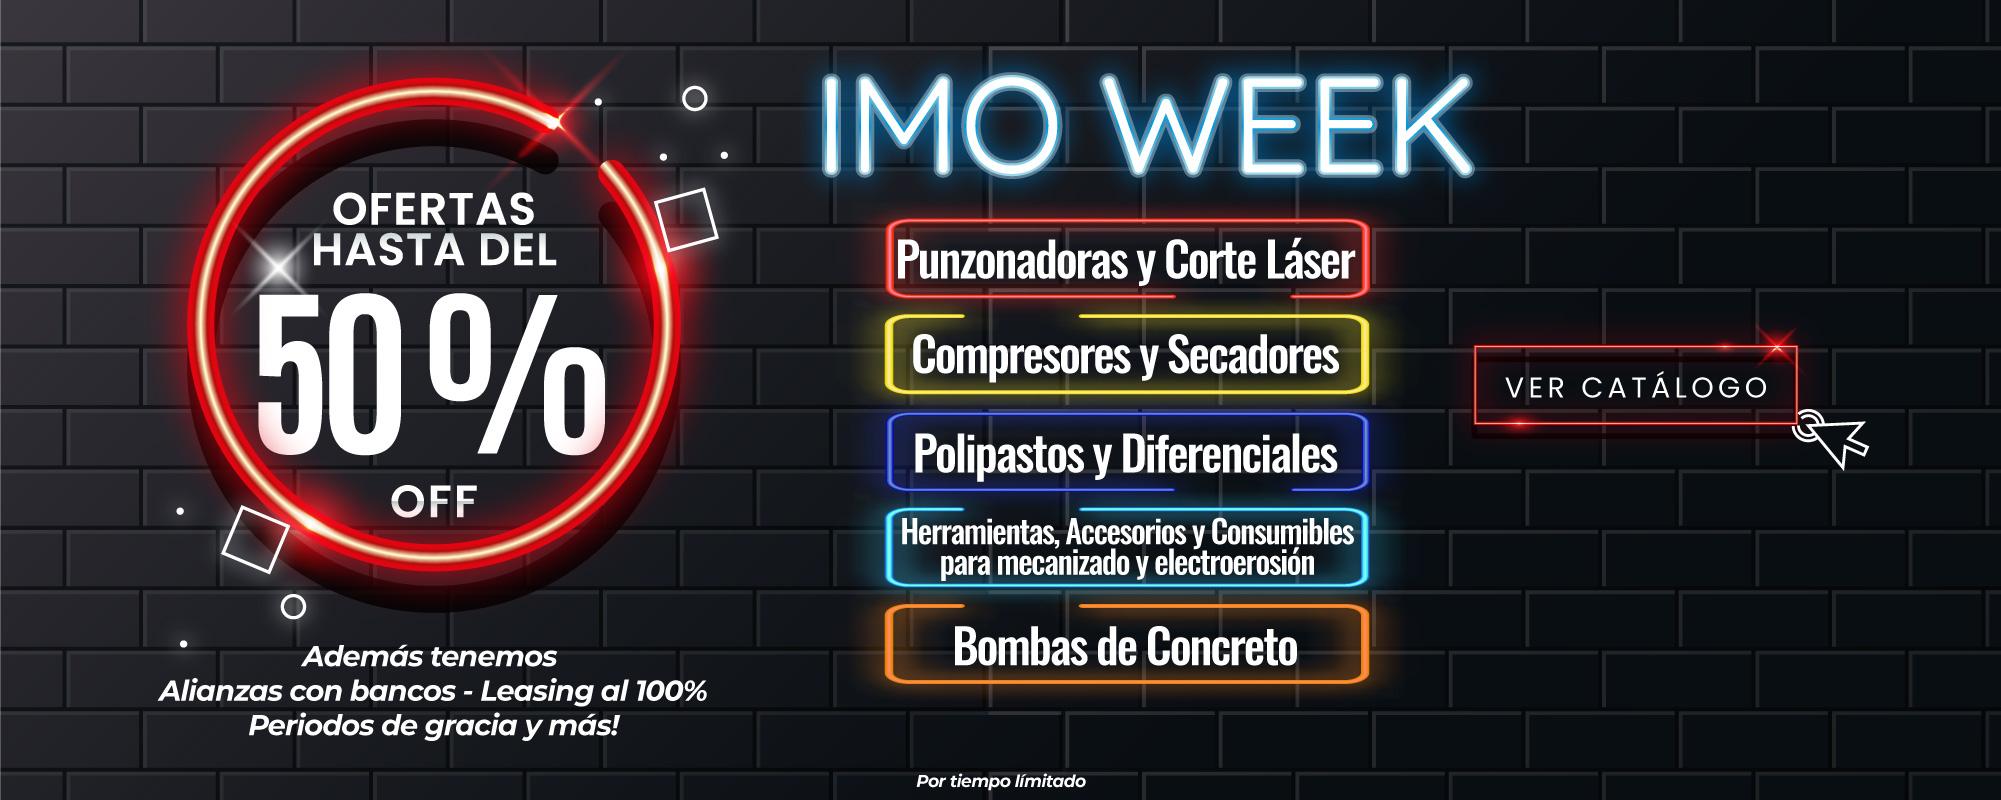 IMO-WEEK-BANNER